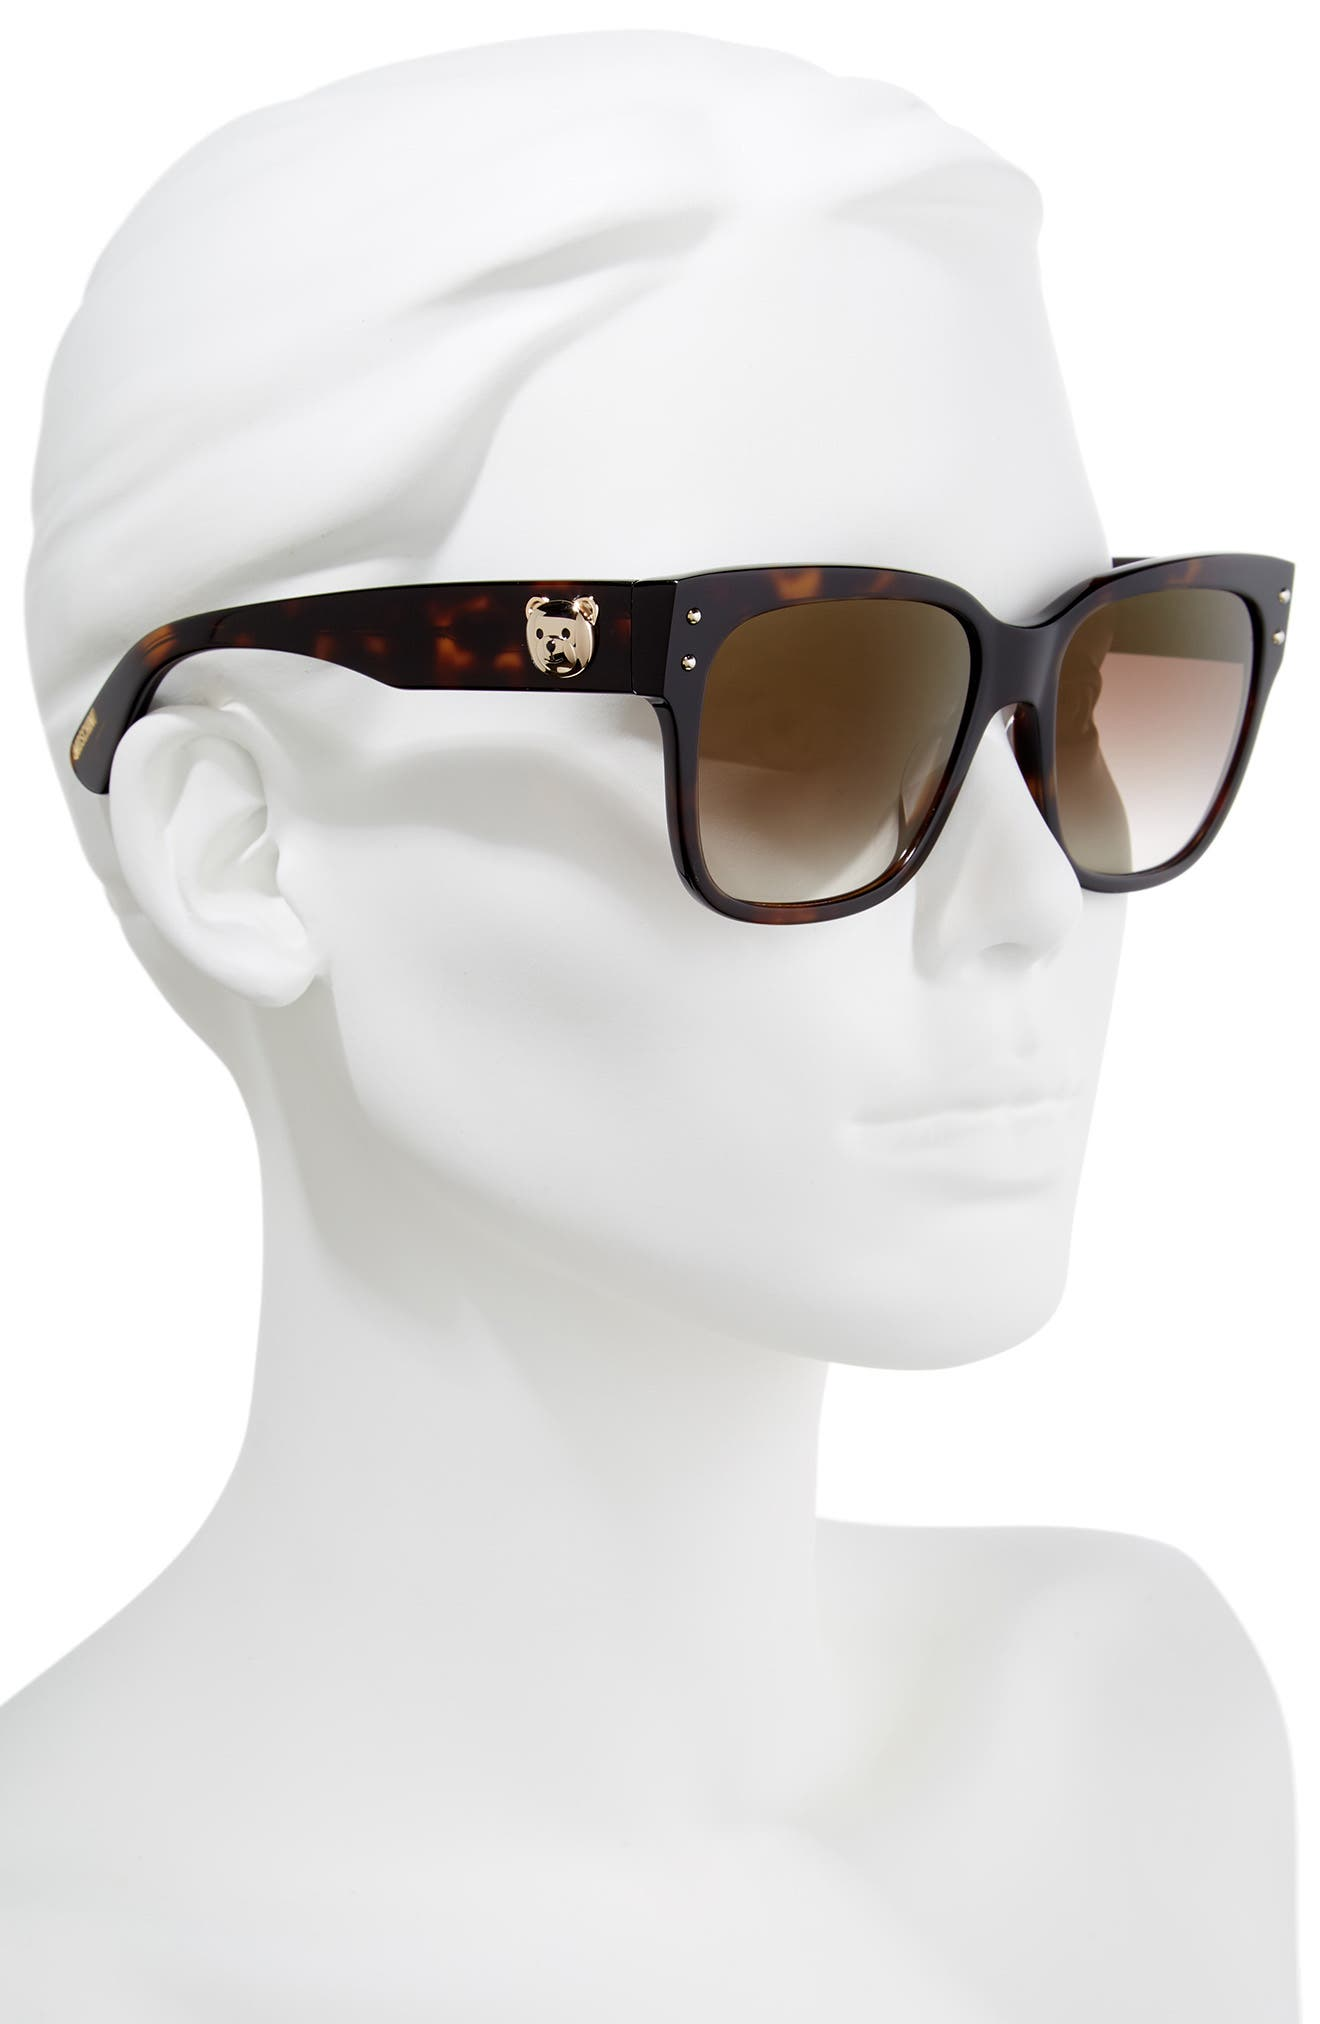 56mm Gradient Lens Sunglasses,                             Alternate thumbnail 2, color,                             Dark Havana